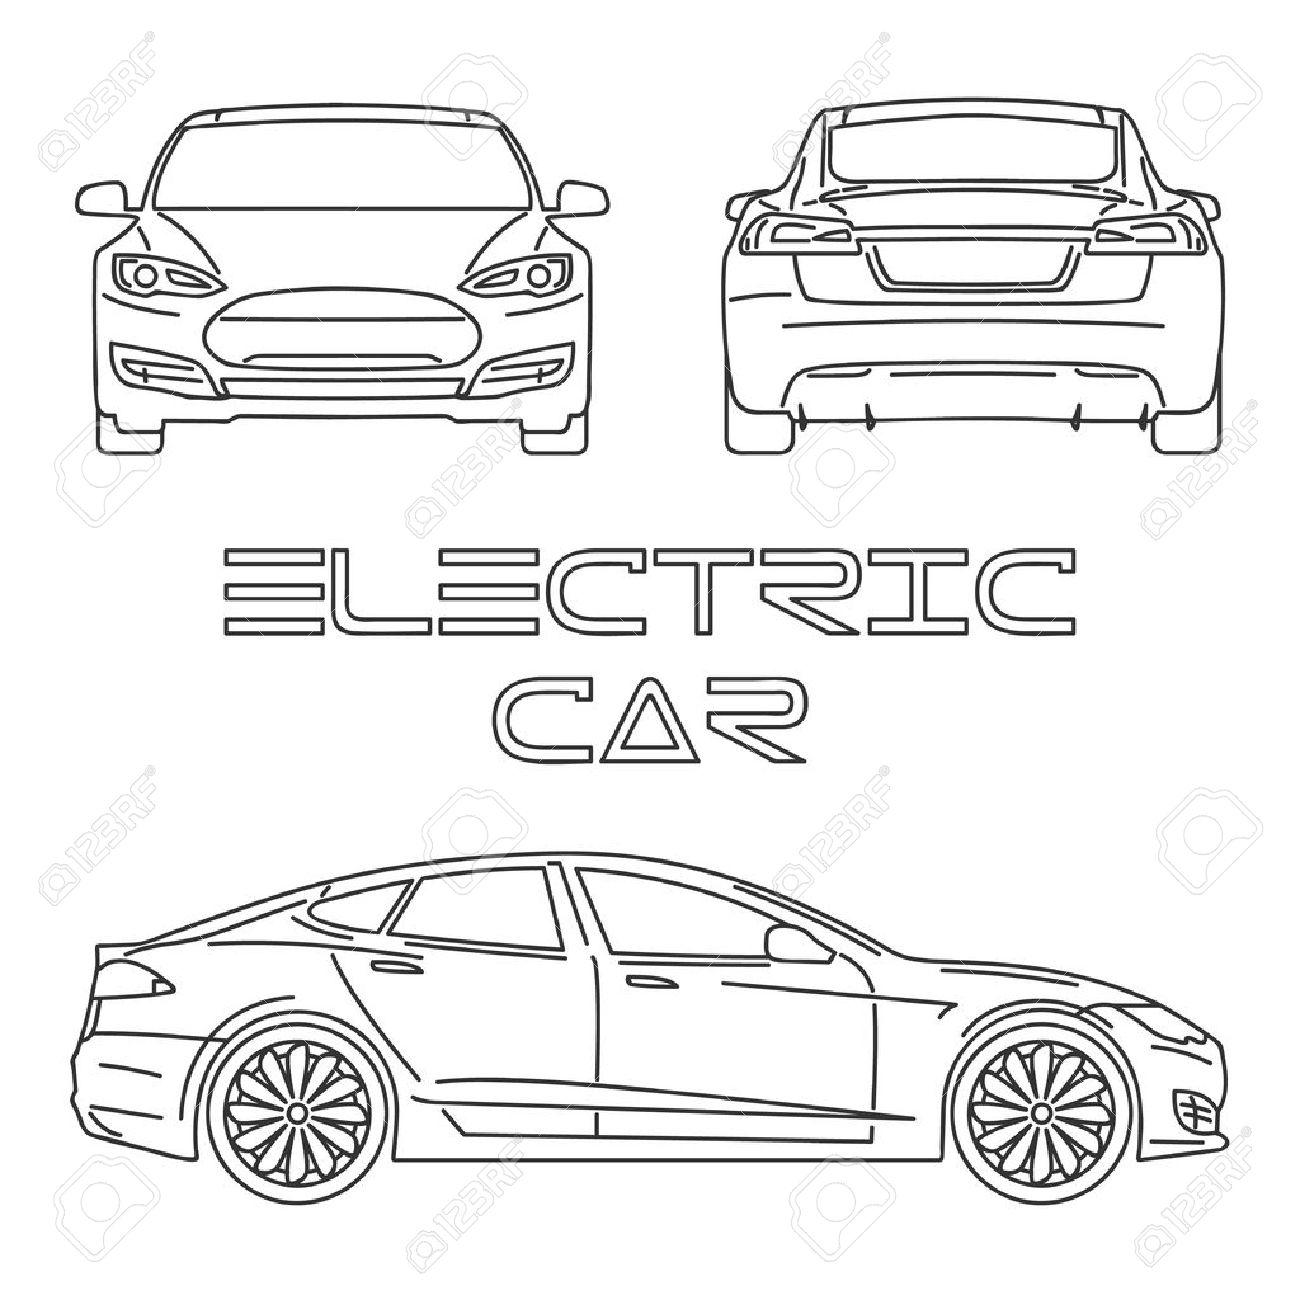 Car Front View Drawing At Getdrawings